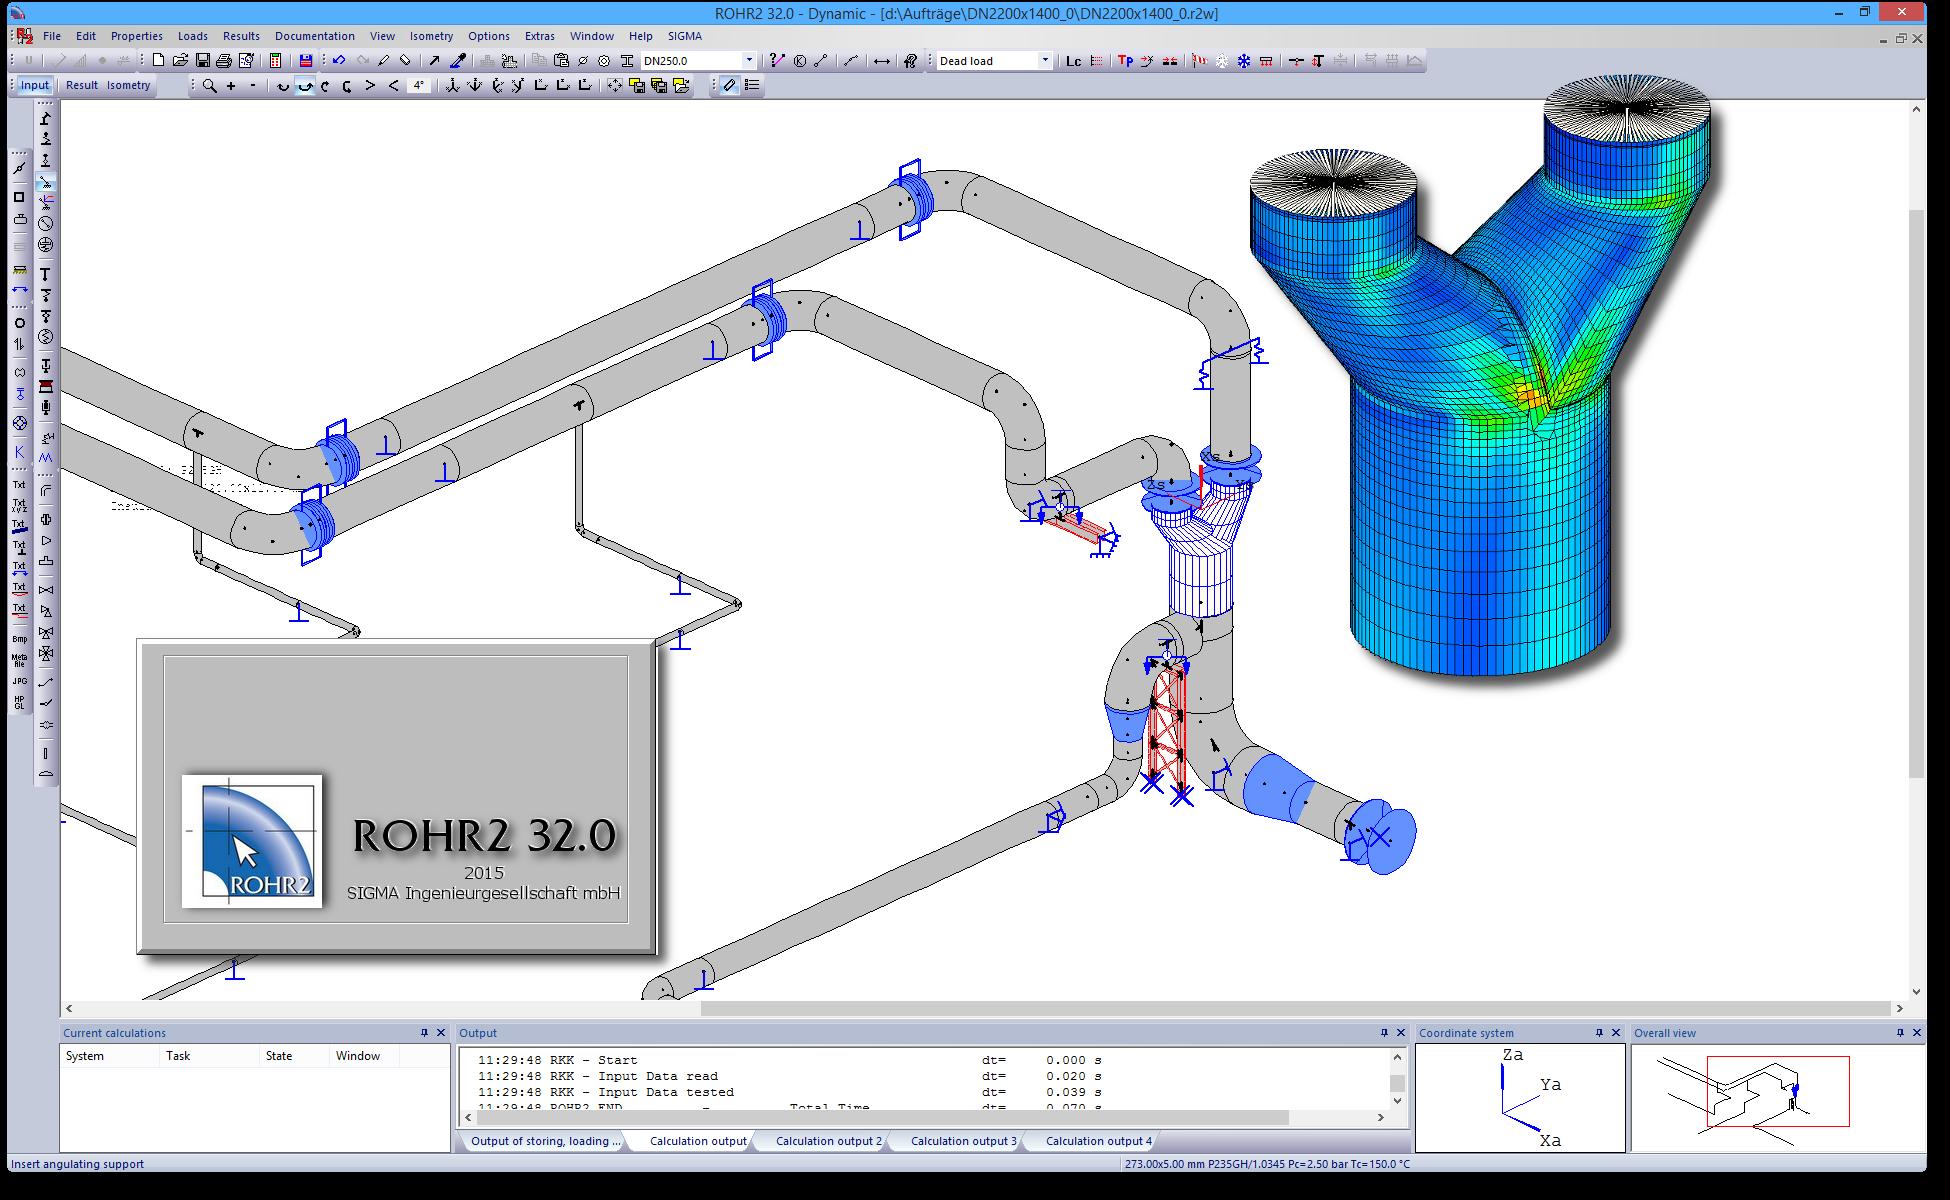 Piping software santambrogio servizi industriali since ccuart Choice Image